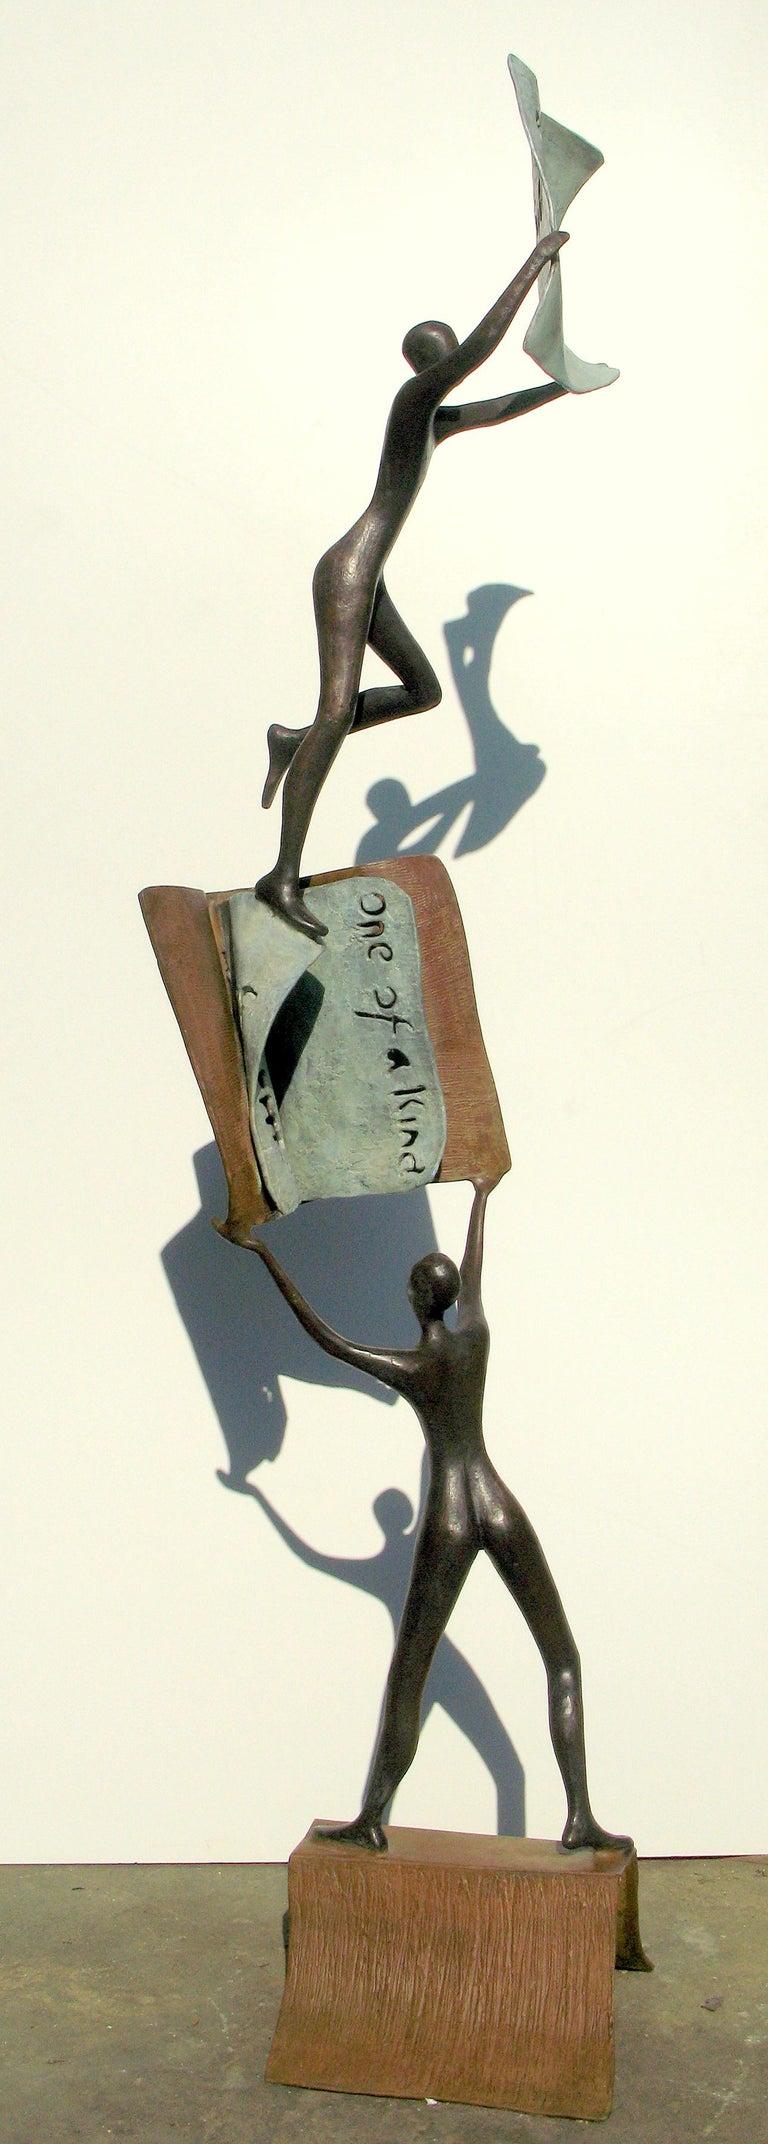 Tolla Inbar, My first book, Bronze sculpture - Sculpture by Tolla Inbar